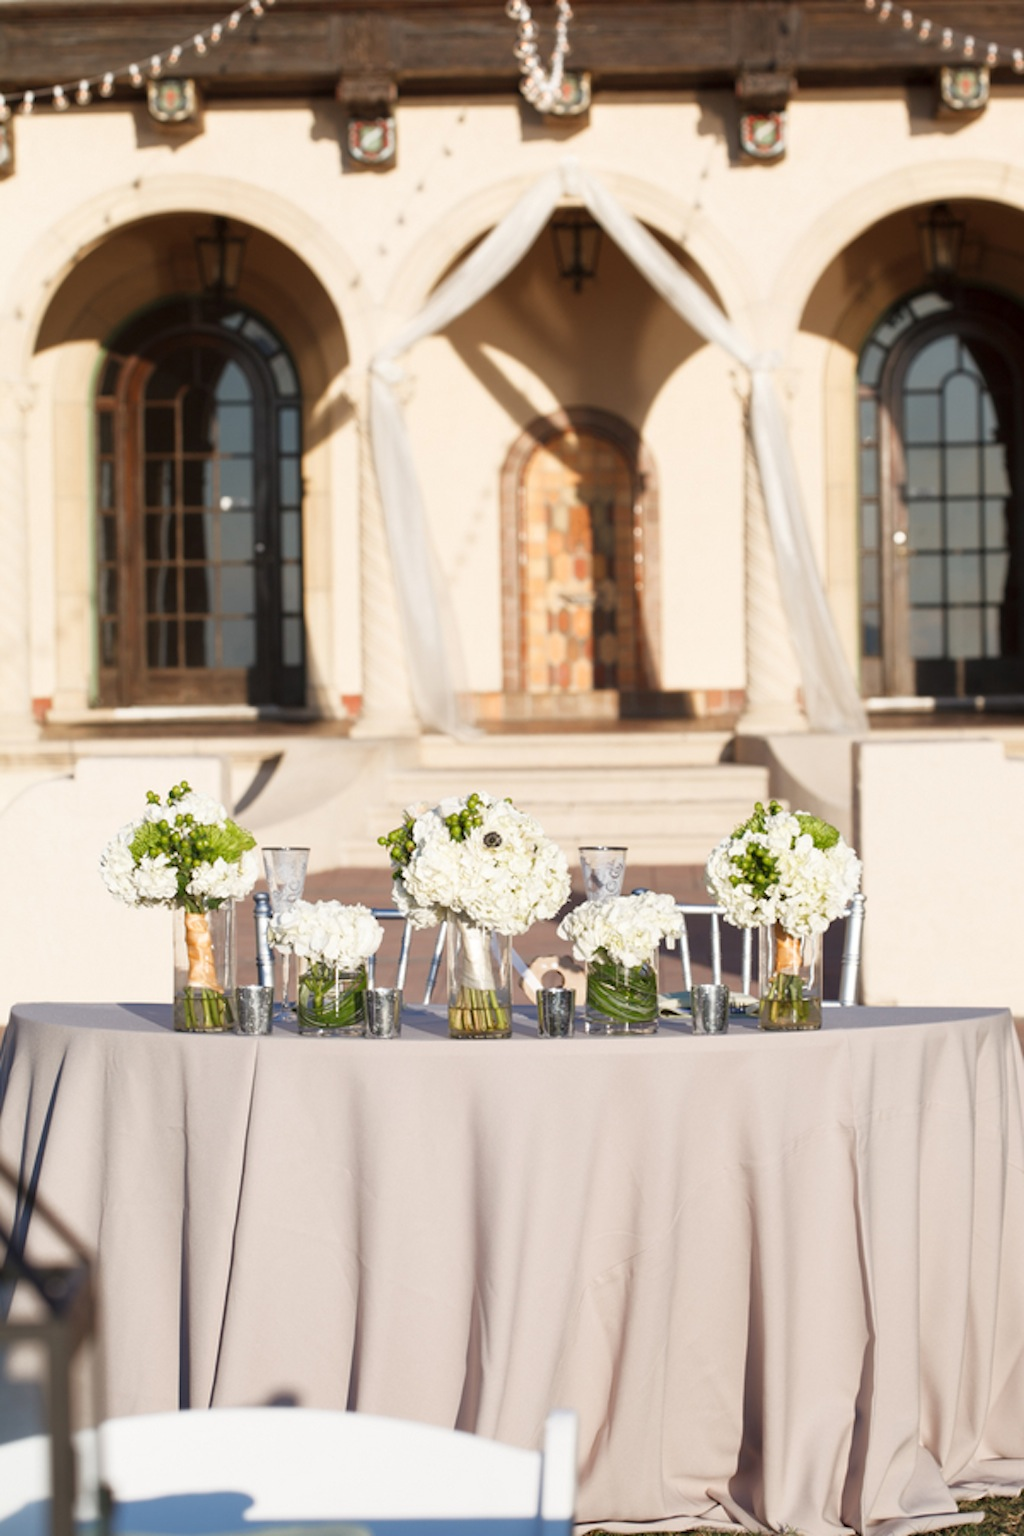 While Wedding Bouquet Centerpieces